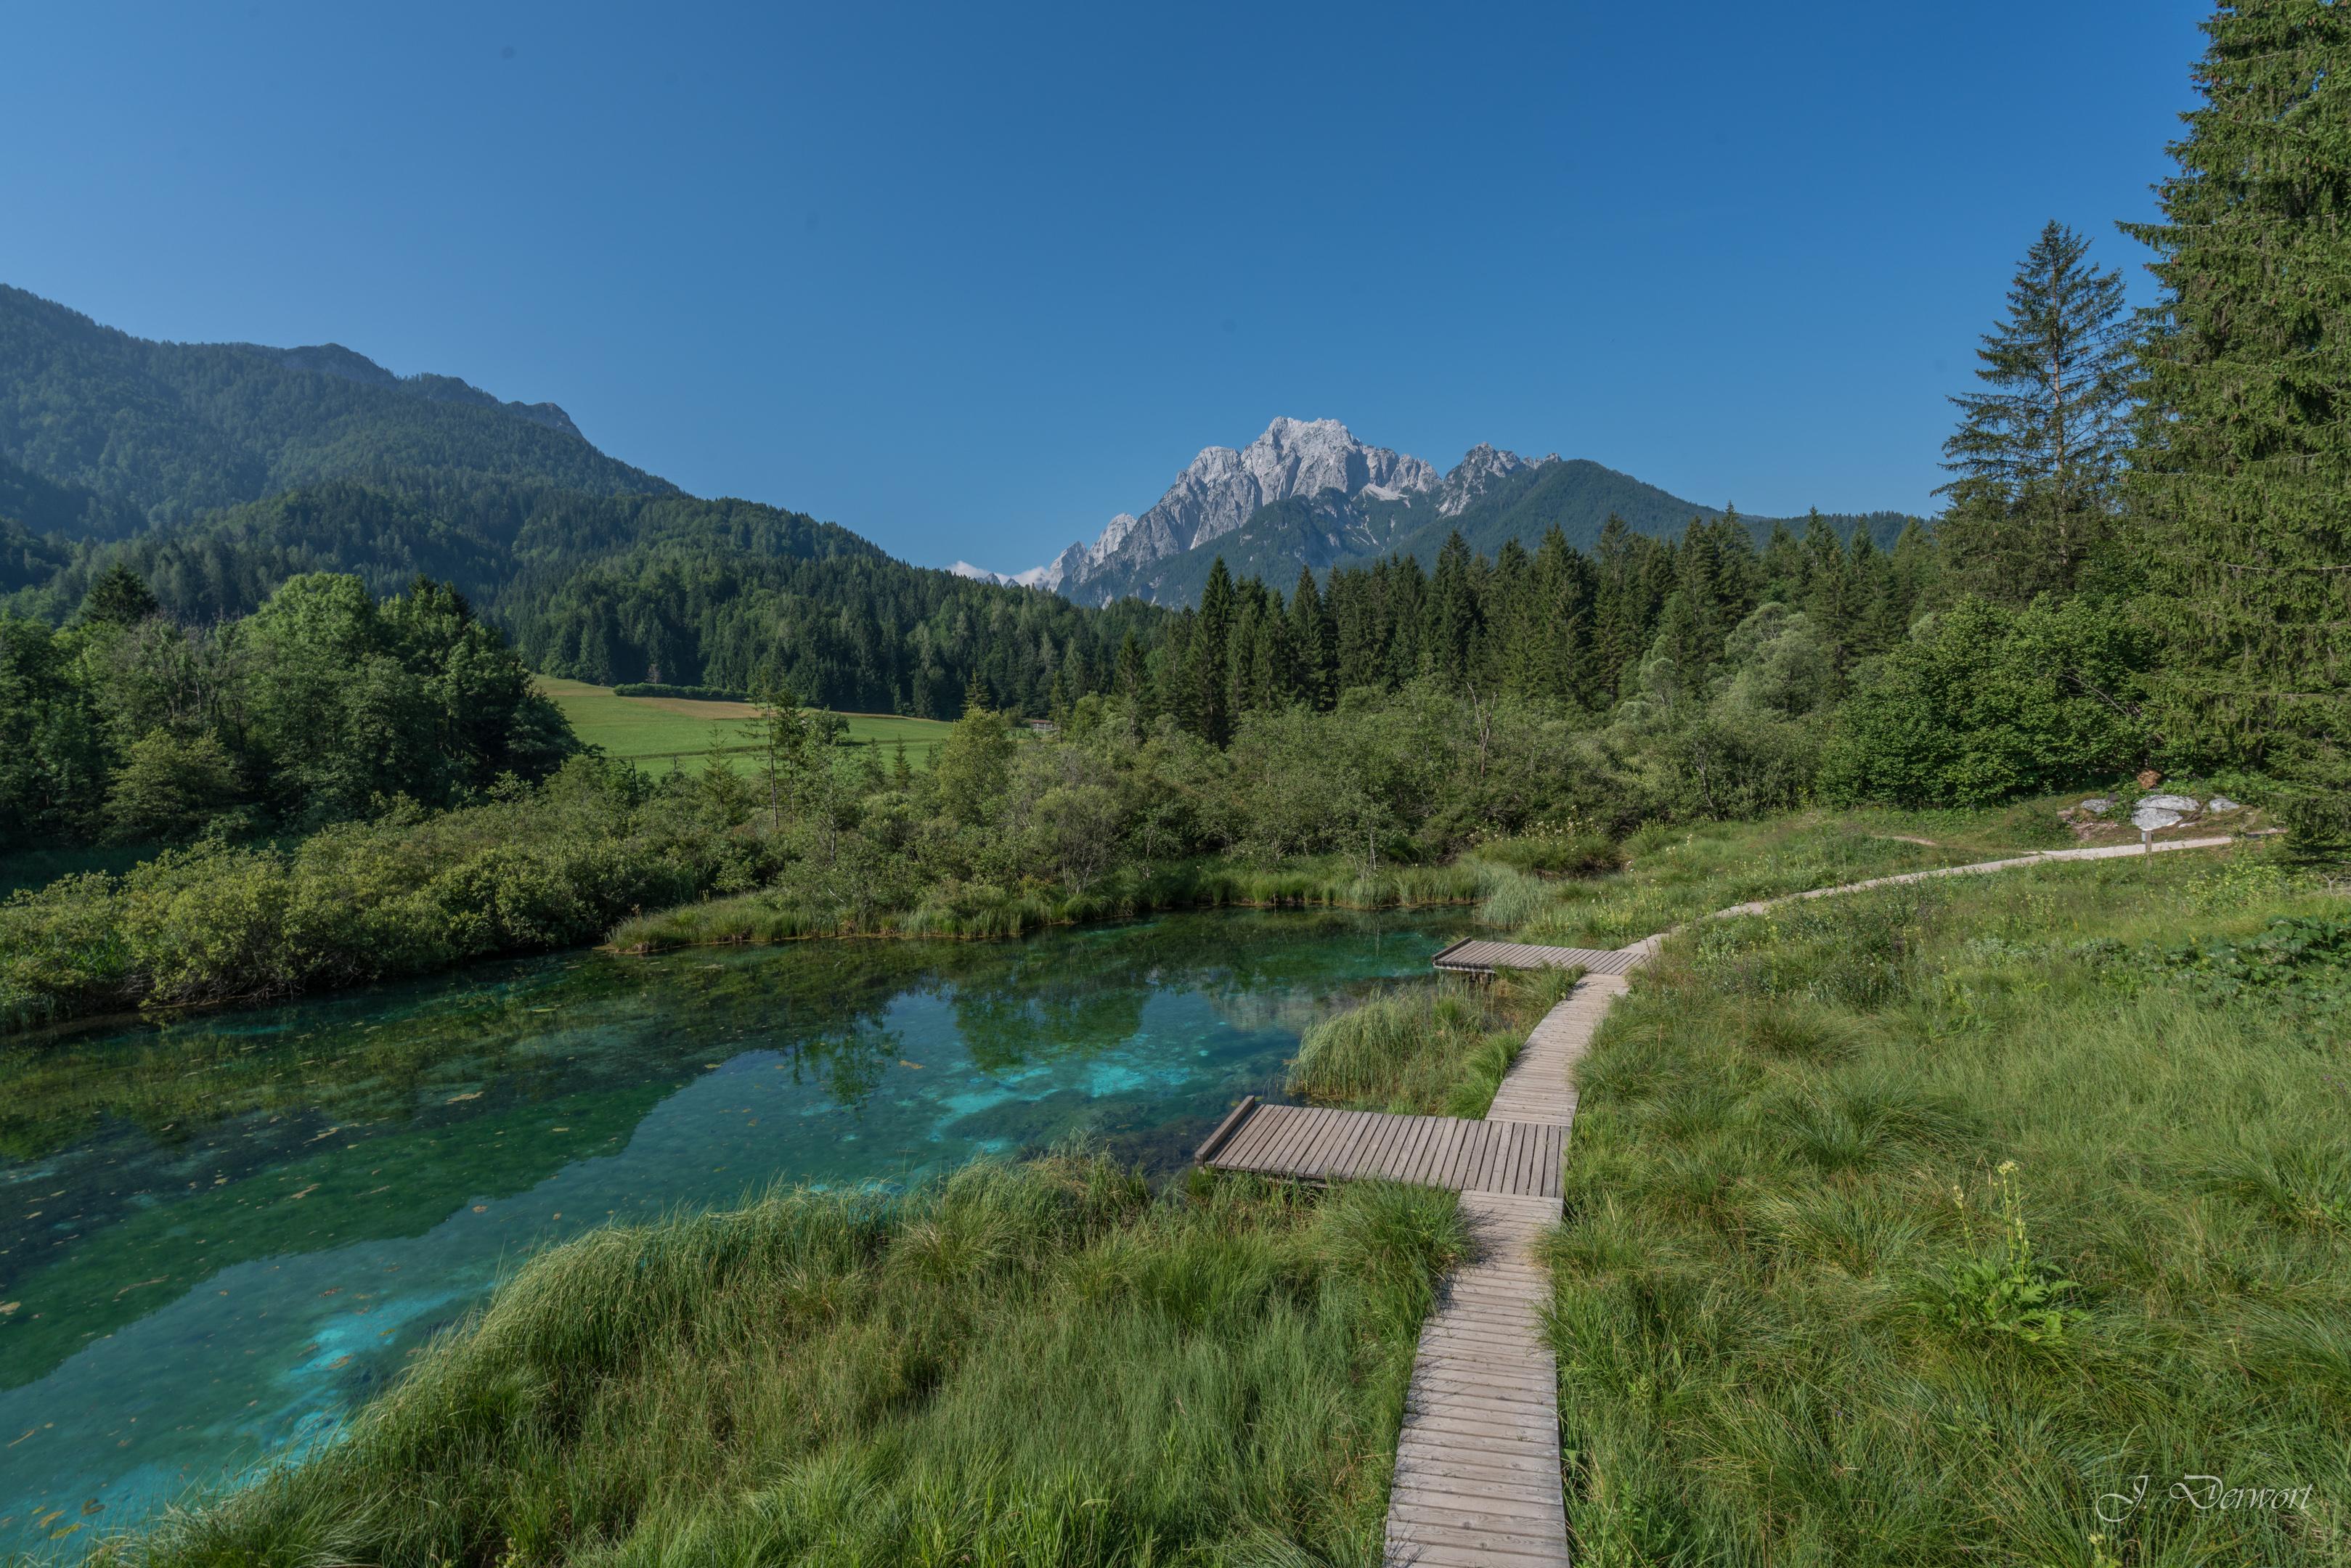 The Julian Alps in Slovenia